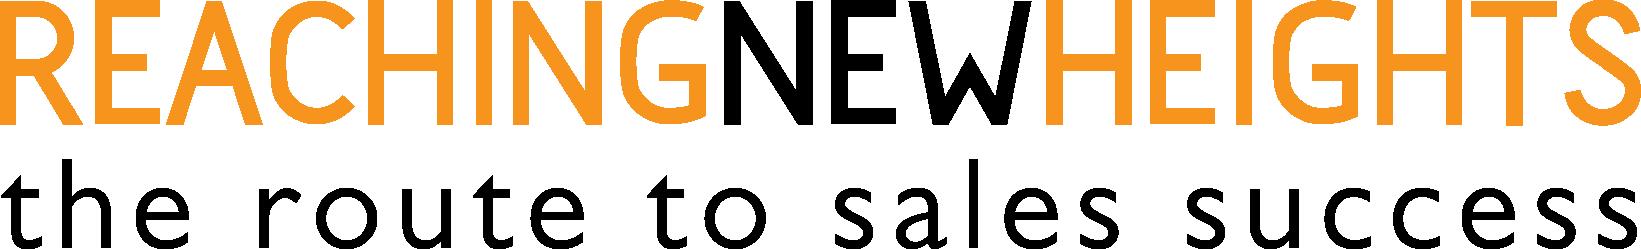 RNH-logo-New